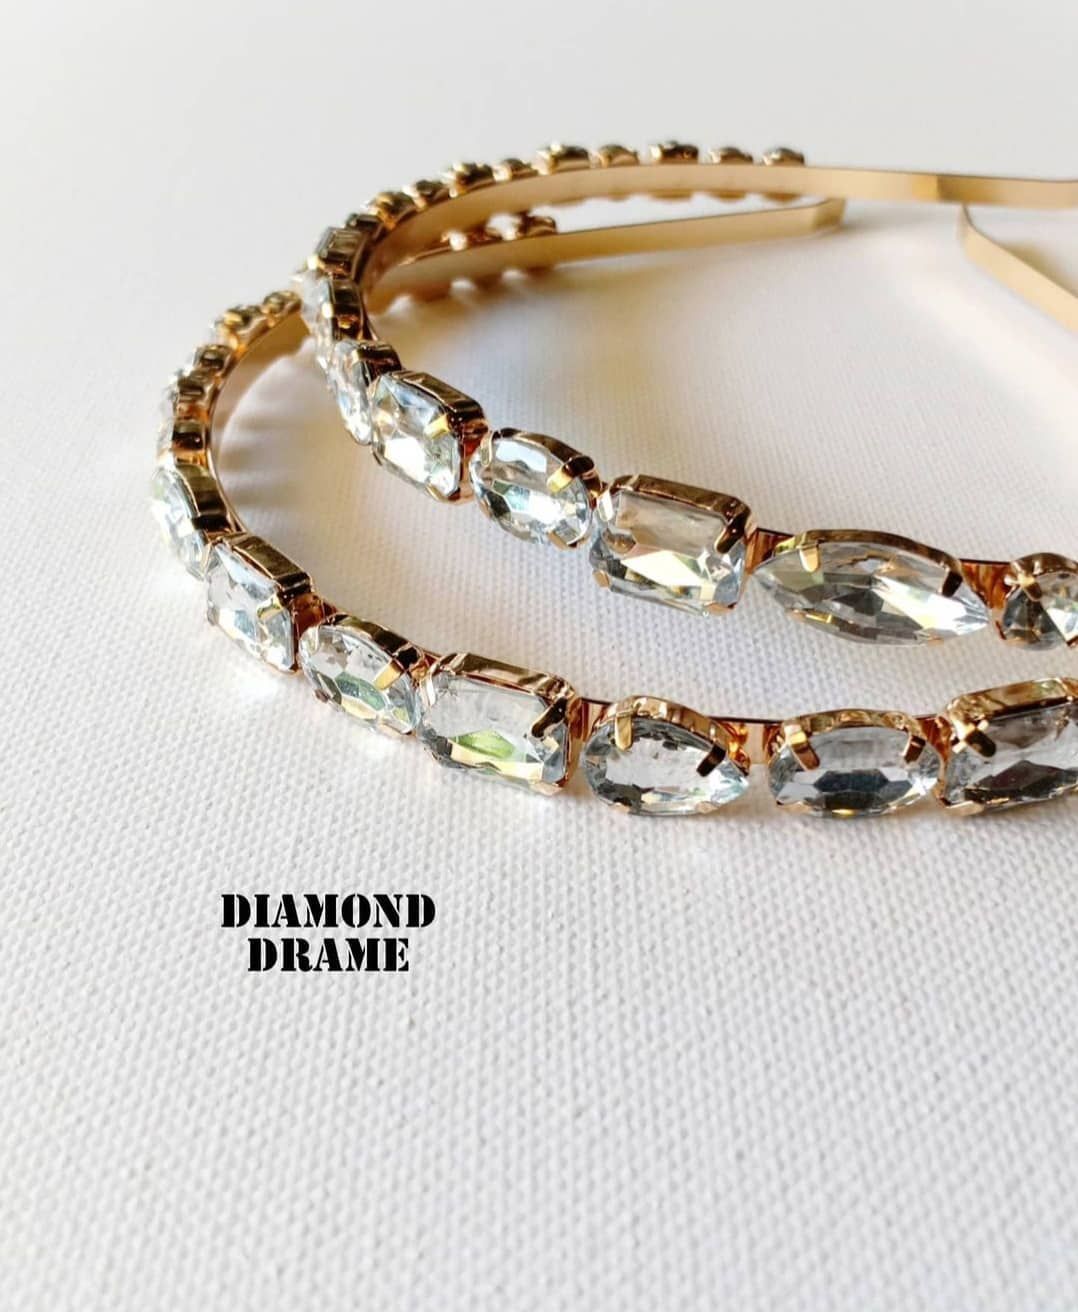 Gold Handmade Headband with Clear Crystal Rhinestones